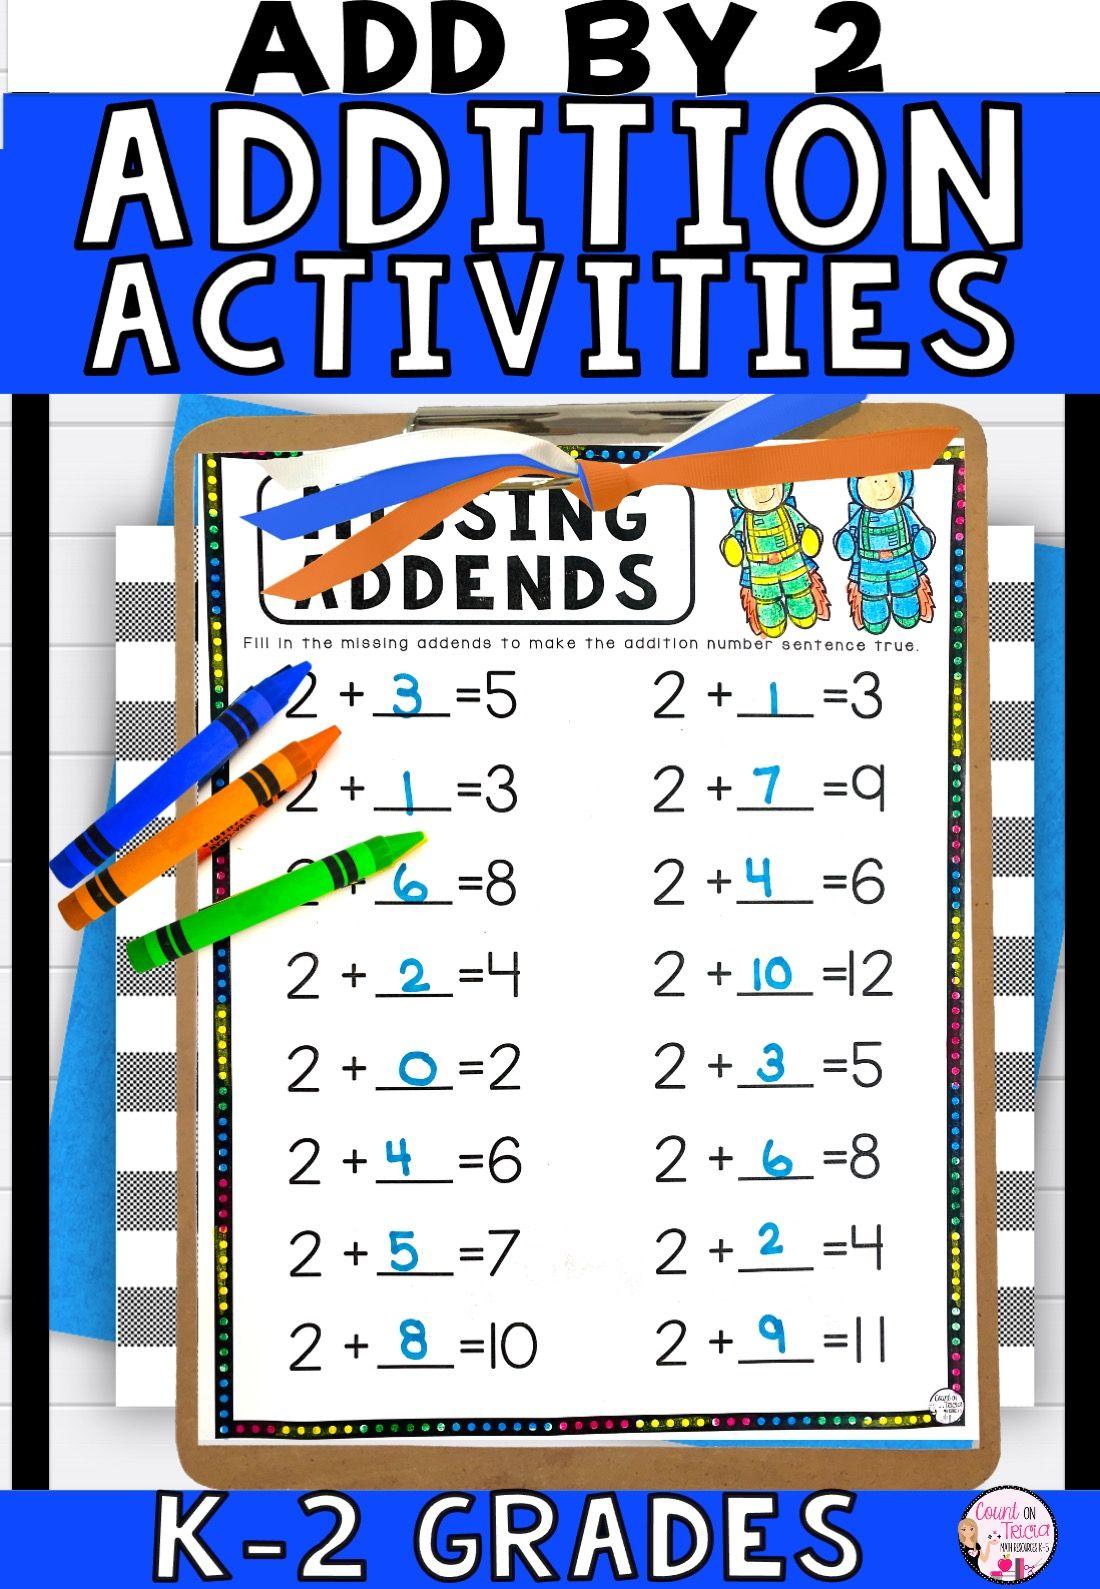 Addition Activities Kindergarten In 2021 Math Activities Elementary Teaching Addition Addition Activities Kindergarten Math addition games grade